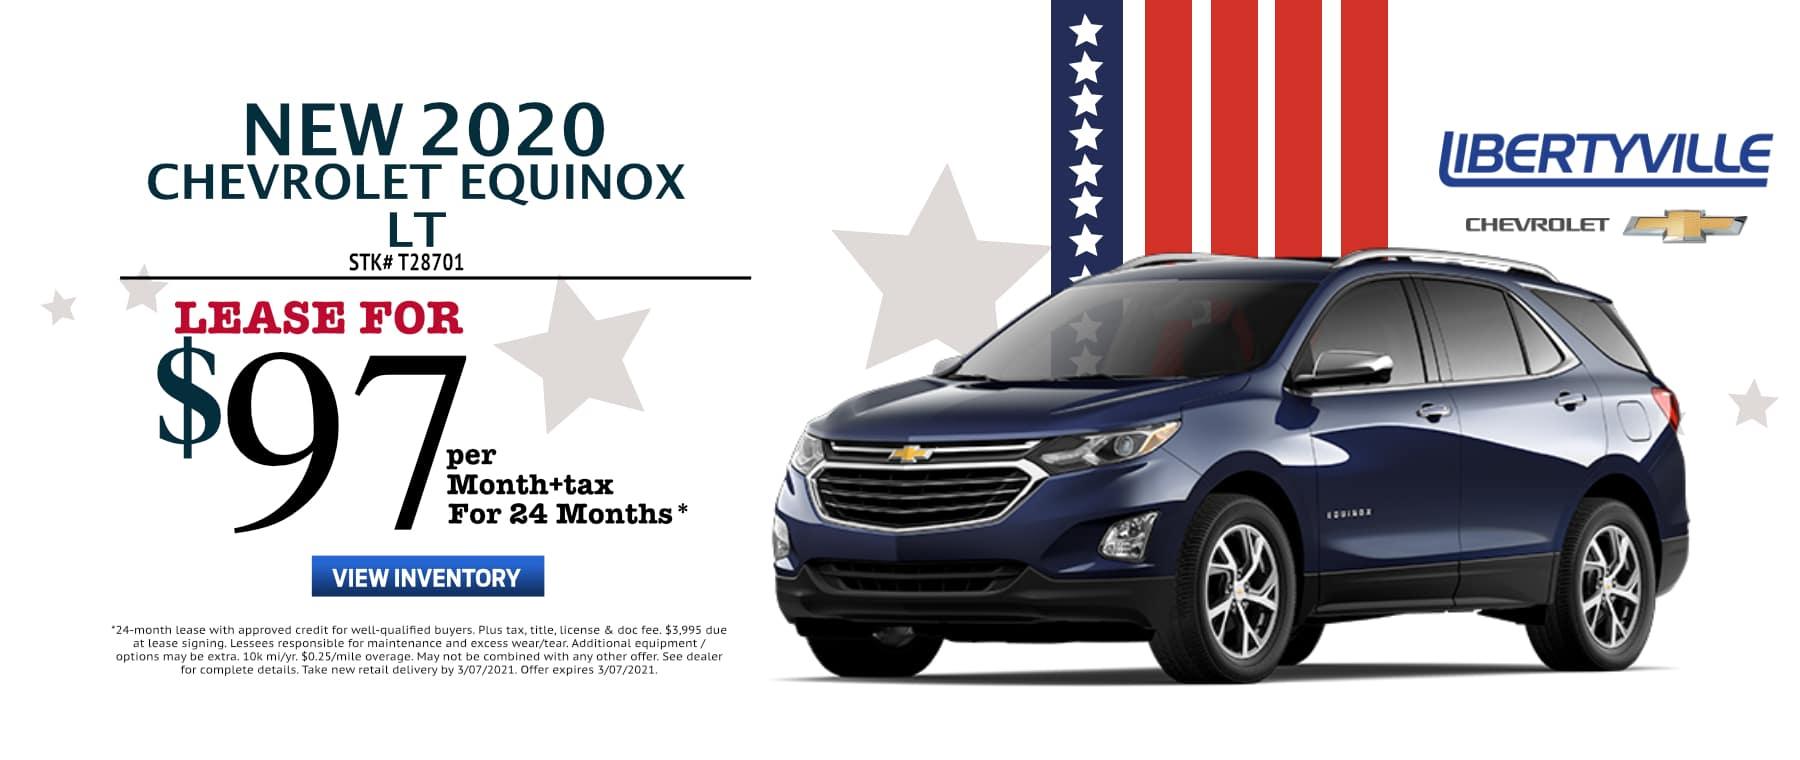 February_2021_EQUINOX_LEASE_Libertyville_Chevrolet